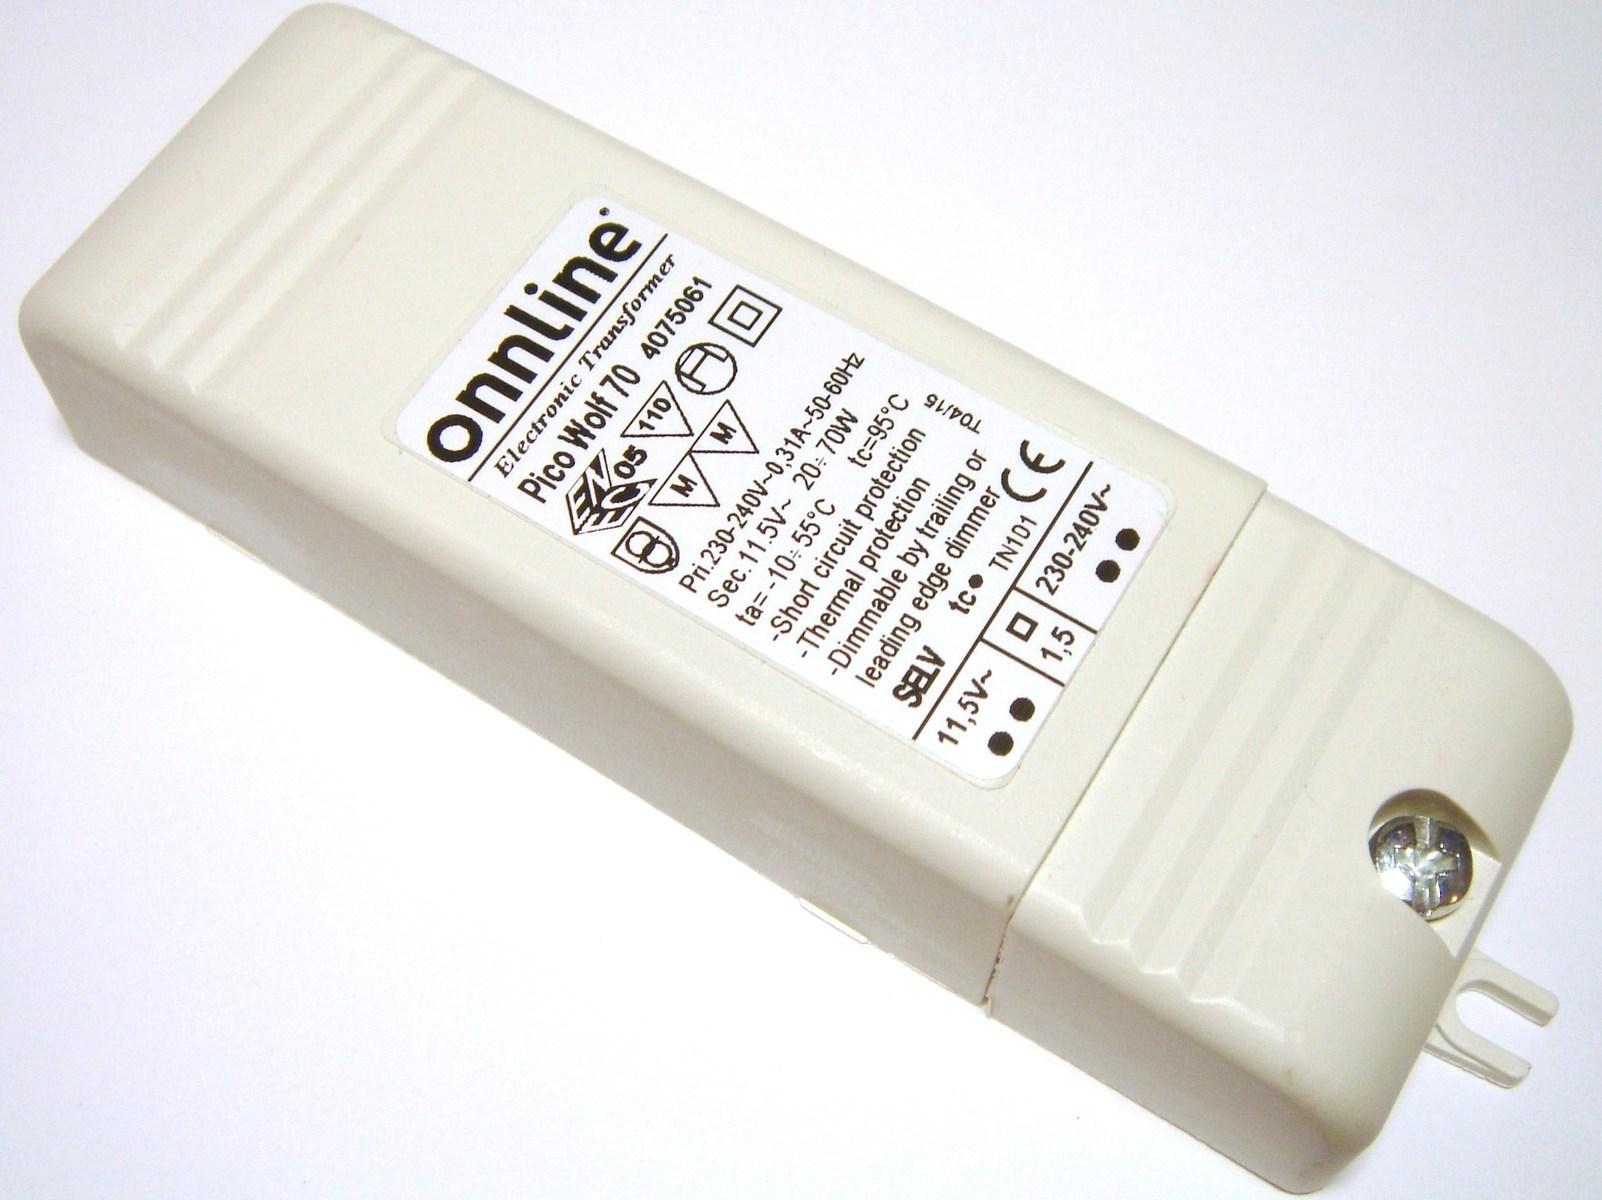 Elektrooniline trafo 12V, 20-70W, Onnline, Pico Wolf 70, 4075061